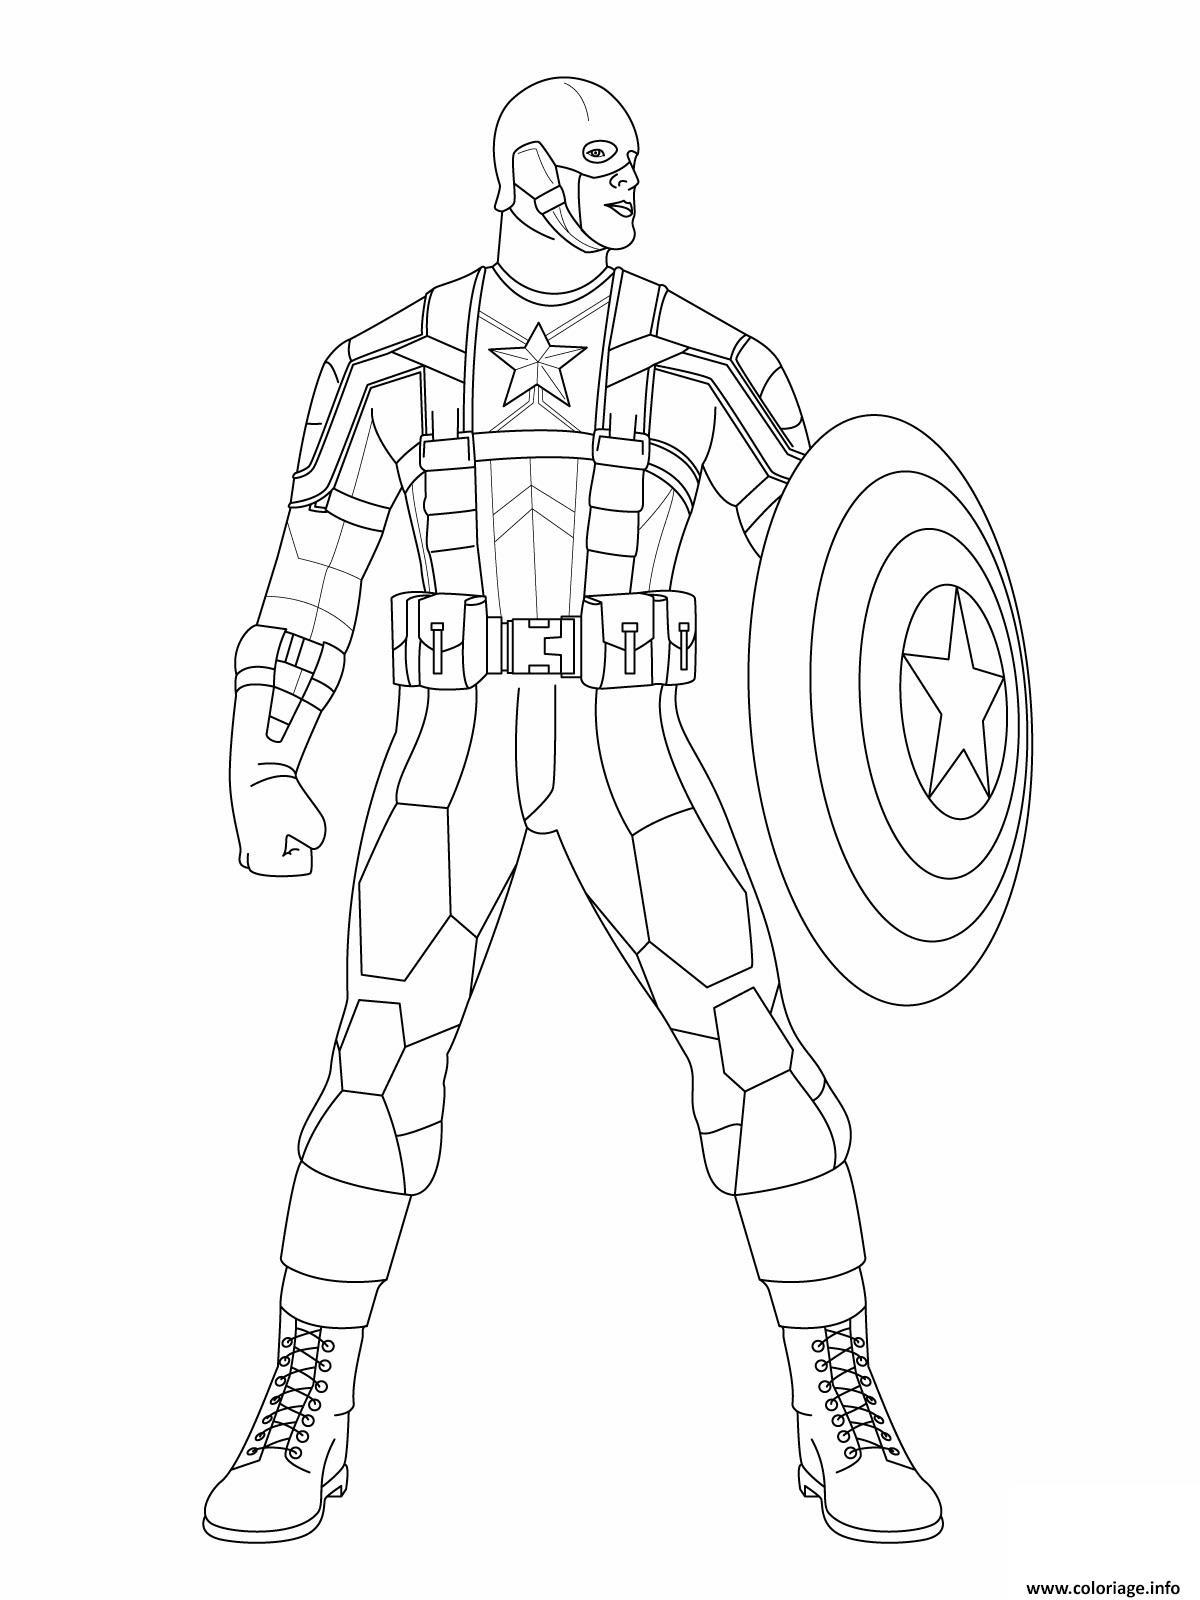 Coloriage Colorier Captain America 11 Jecoloriecom